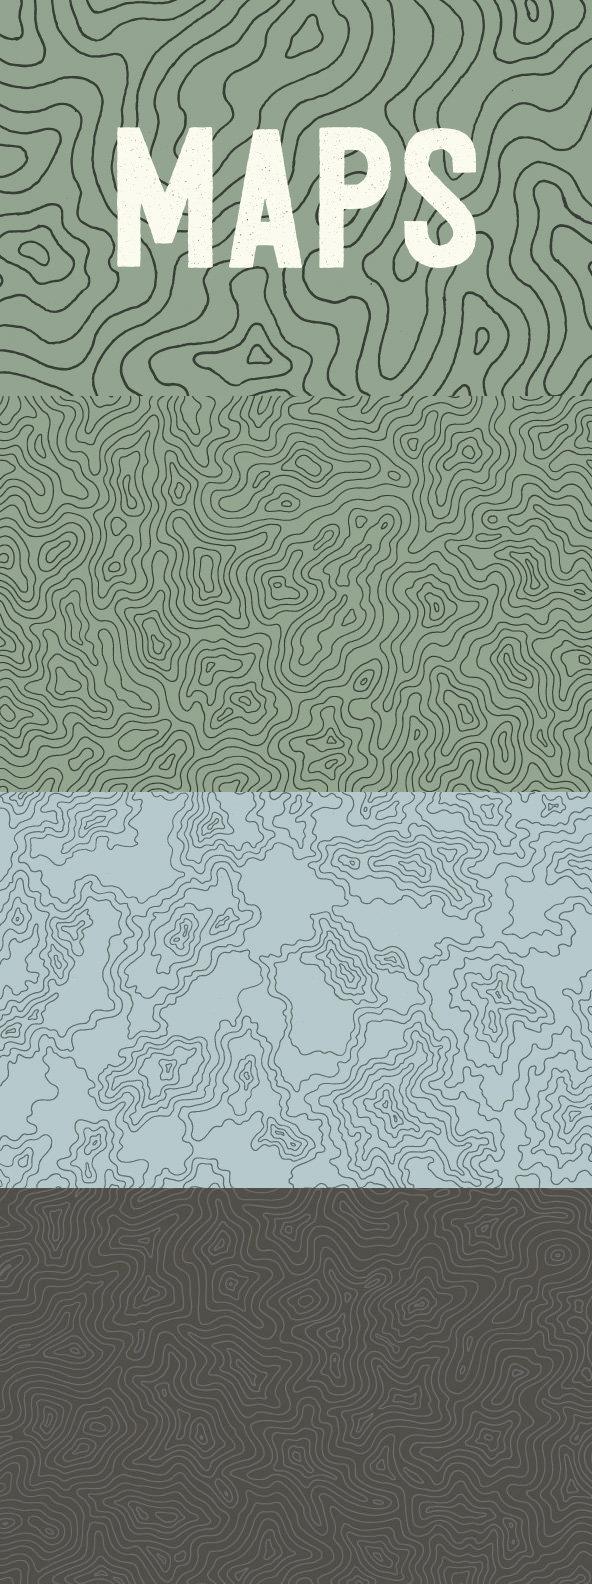 Topographic Elevation Maps   Stock Art   Pinterest   Topographic map ...